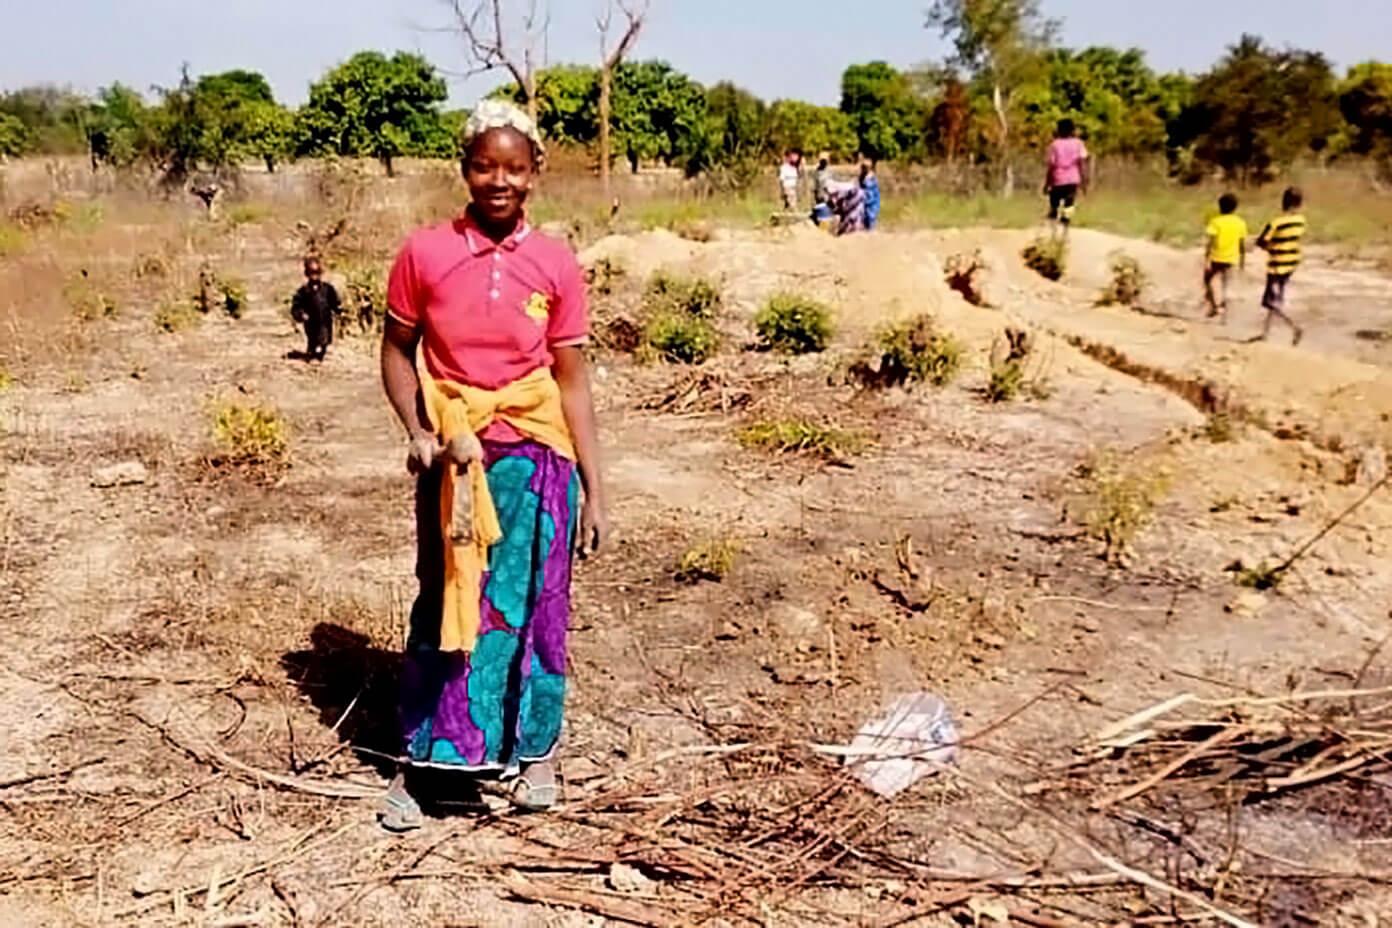 The Wash Project Benkadi Community Garden in Mali